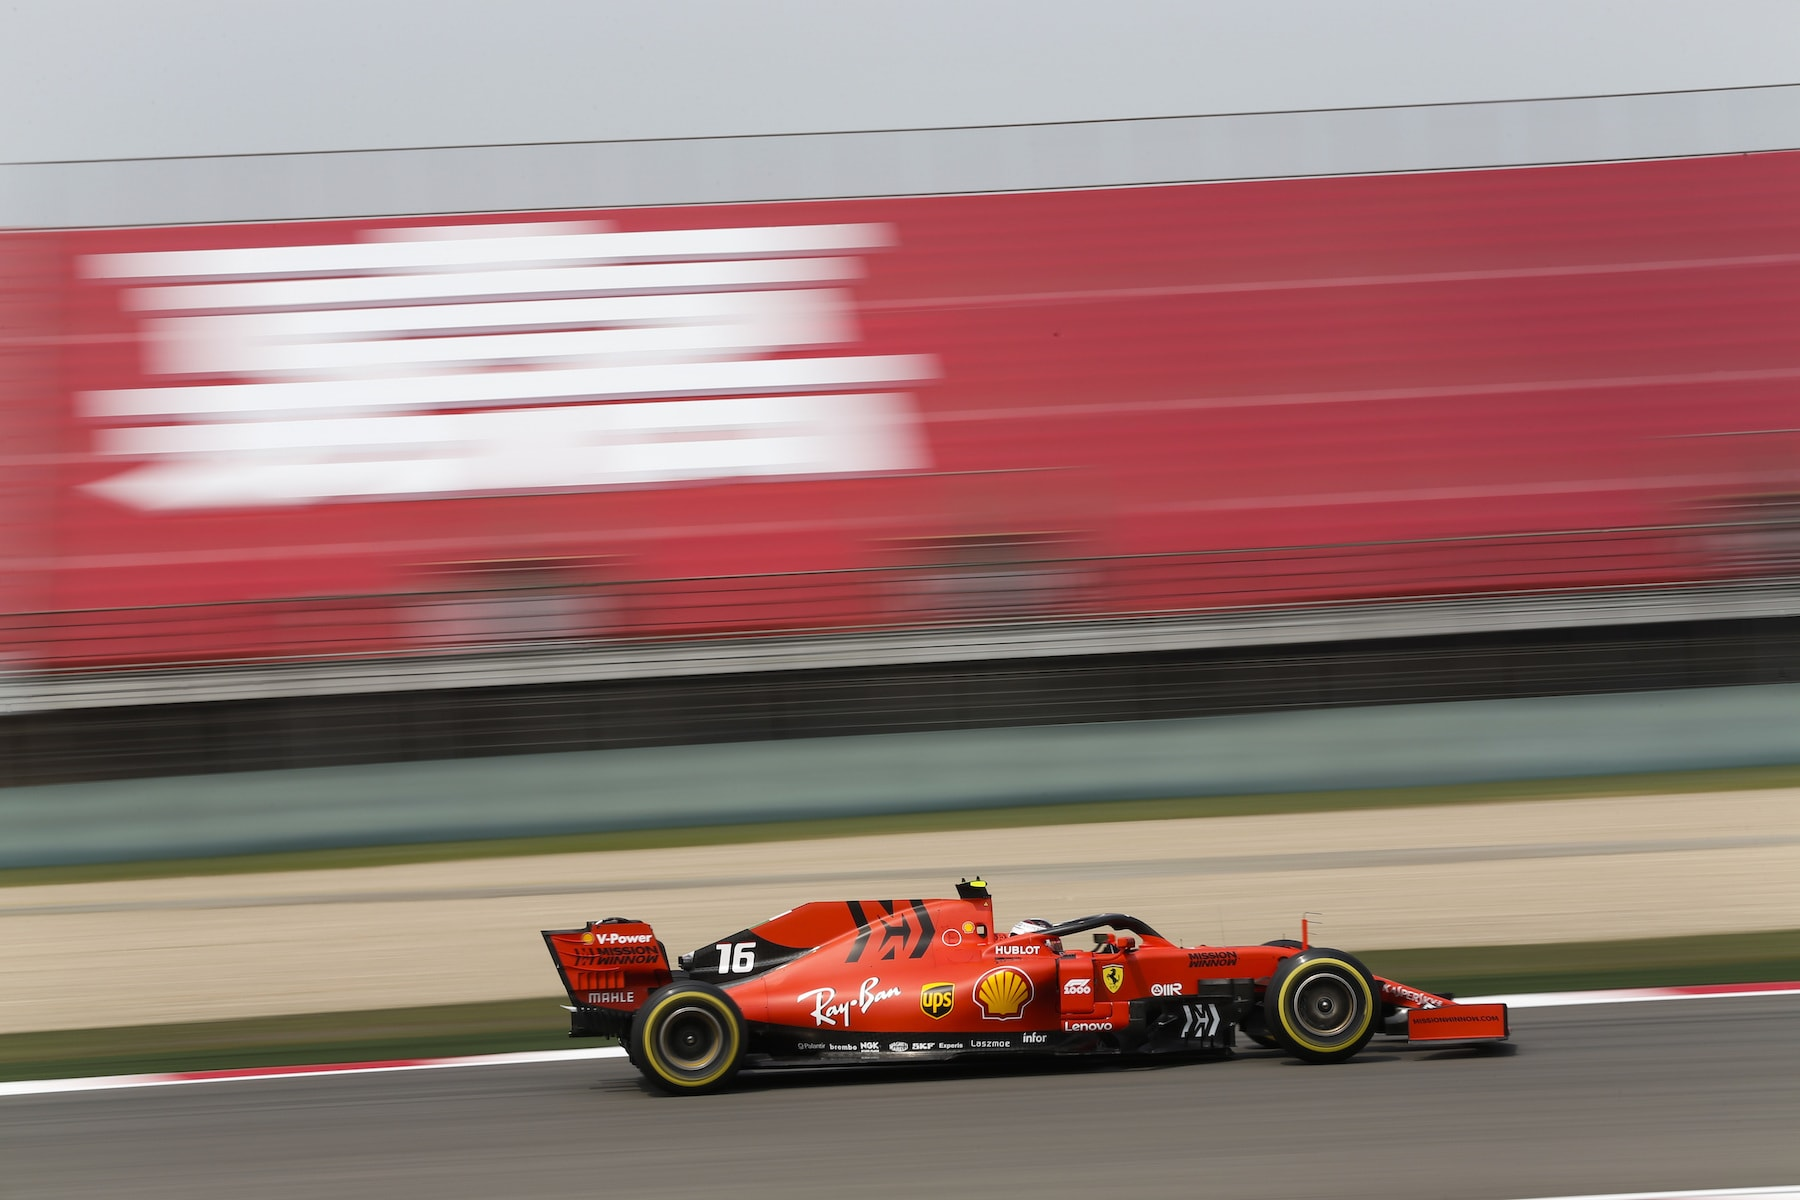 1 2019 Charles Leclerc | Ferrari SF90 | 2019 Chinese GP FP1 1 copy.jpg